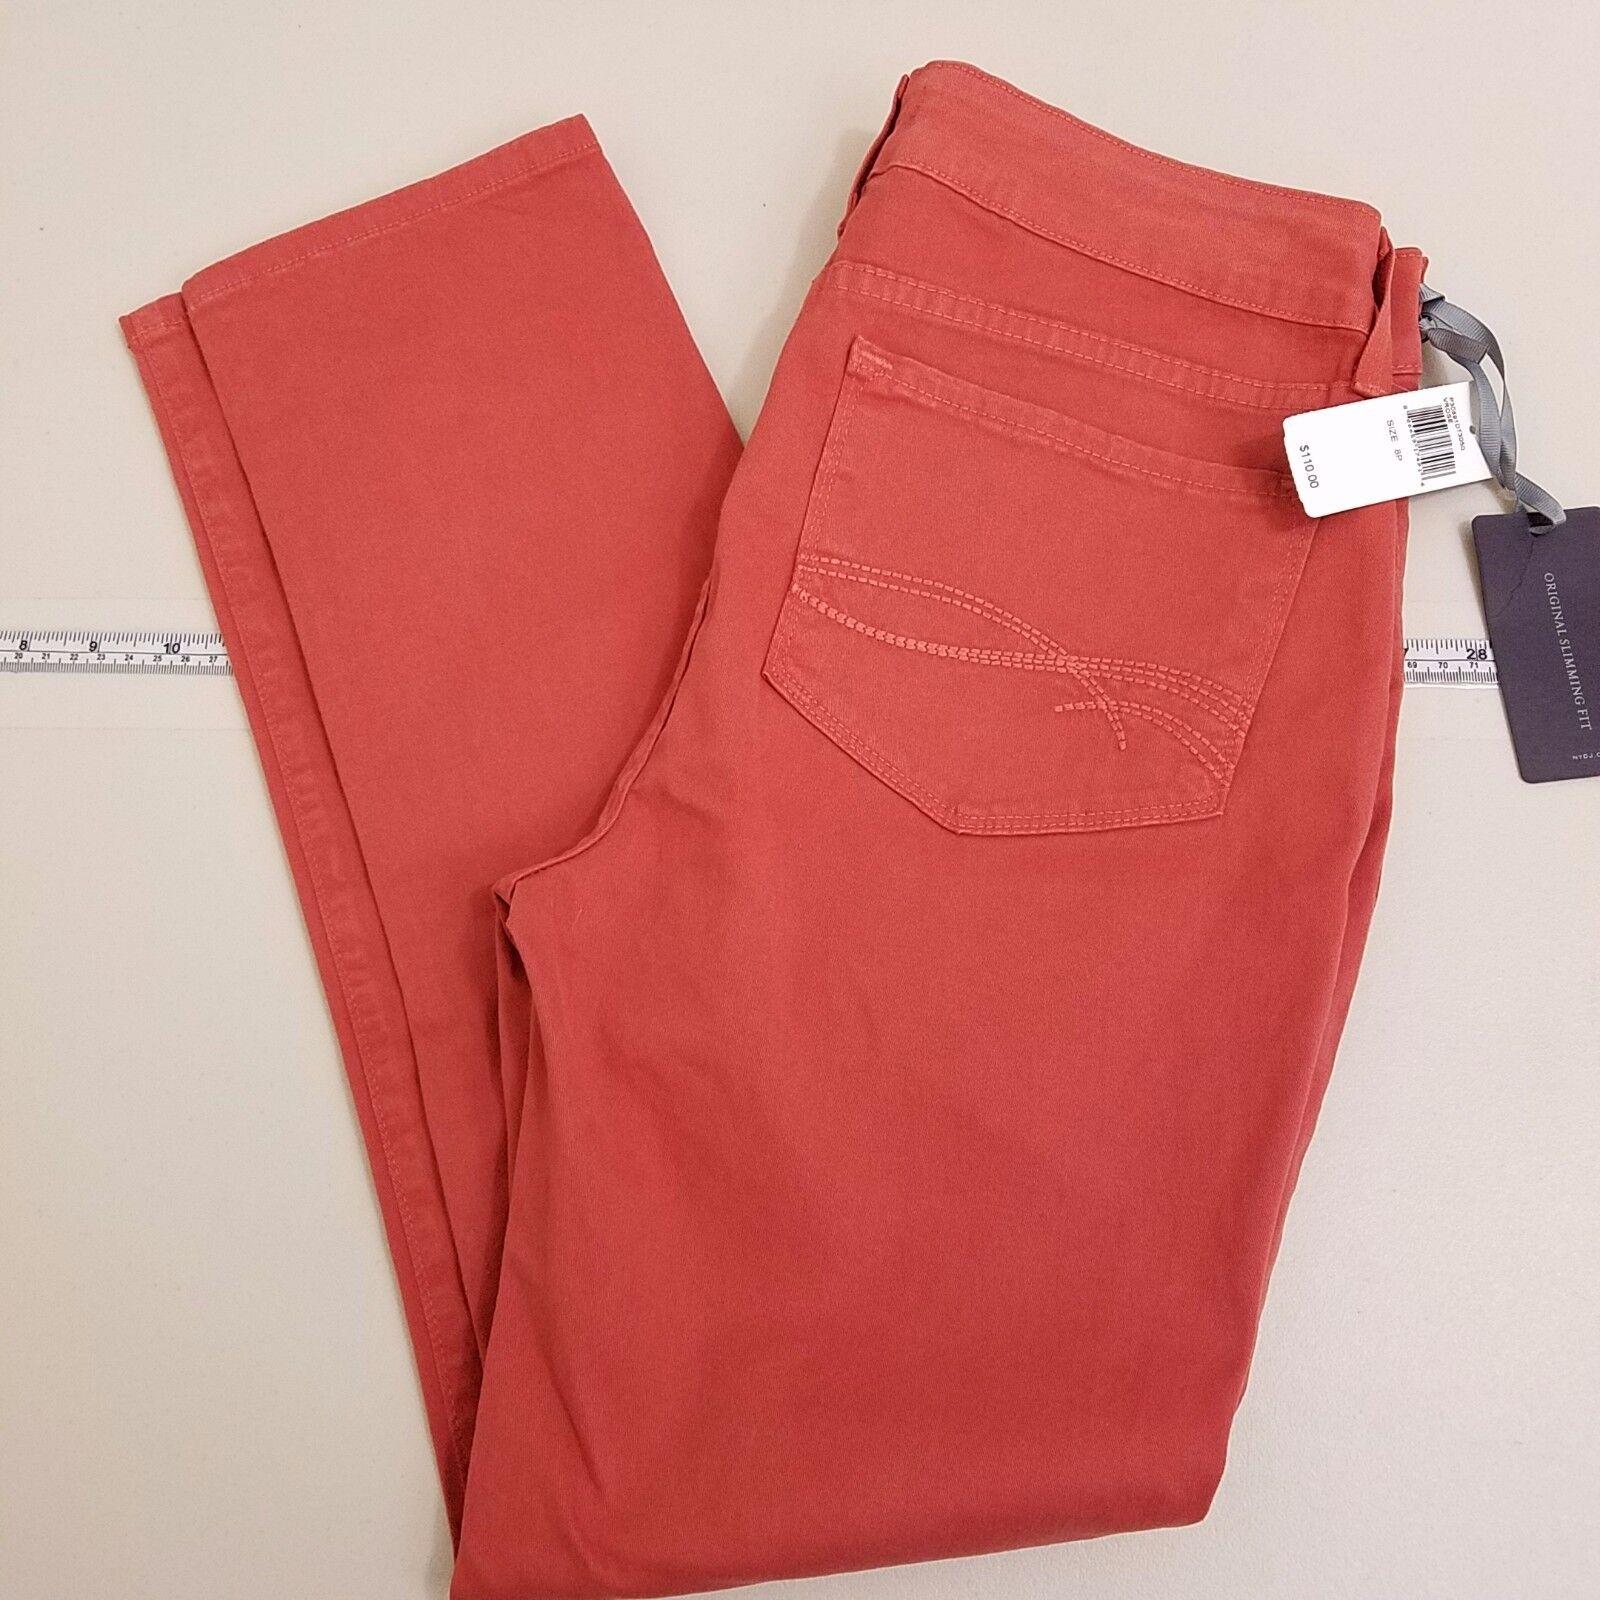 NYDJ Skinny Slim Jeans Women's Size 8P Petite Salmon Pink NEW NWT